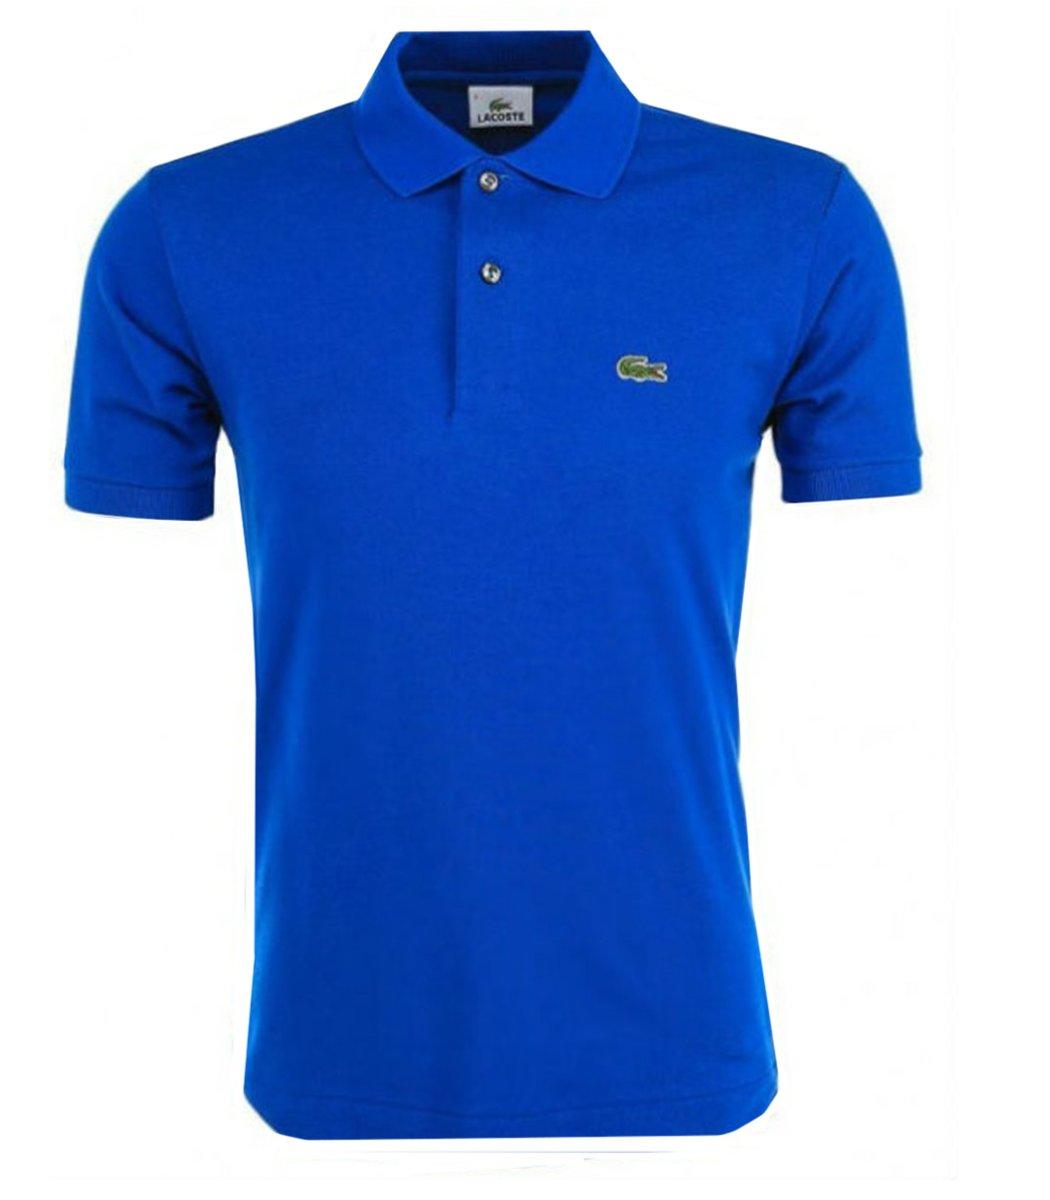 Мужская синяя футболка поло Lacoste